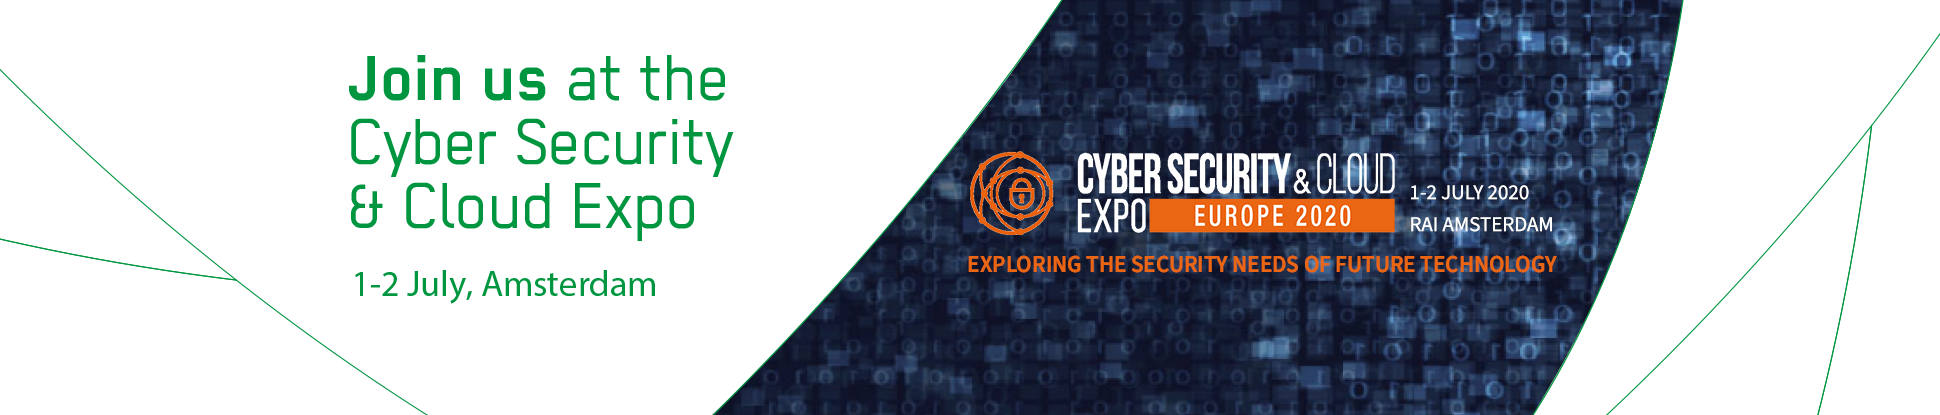 Cyber Security Cloud Expo _Jumbotron